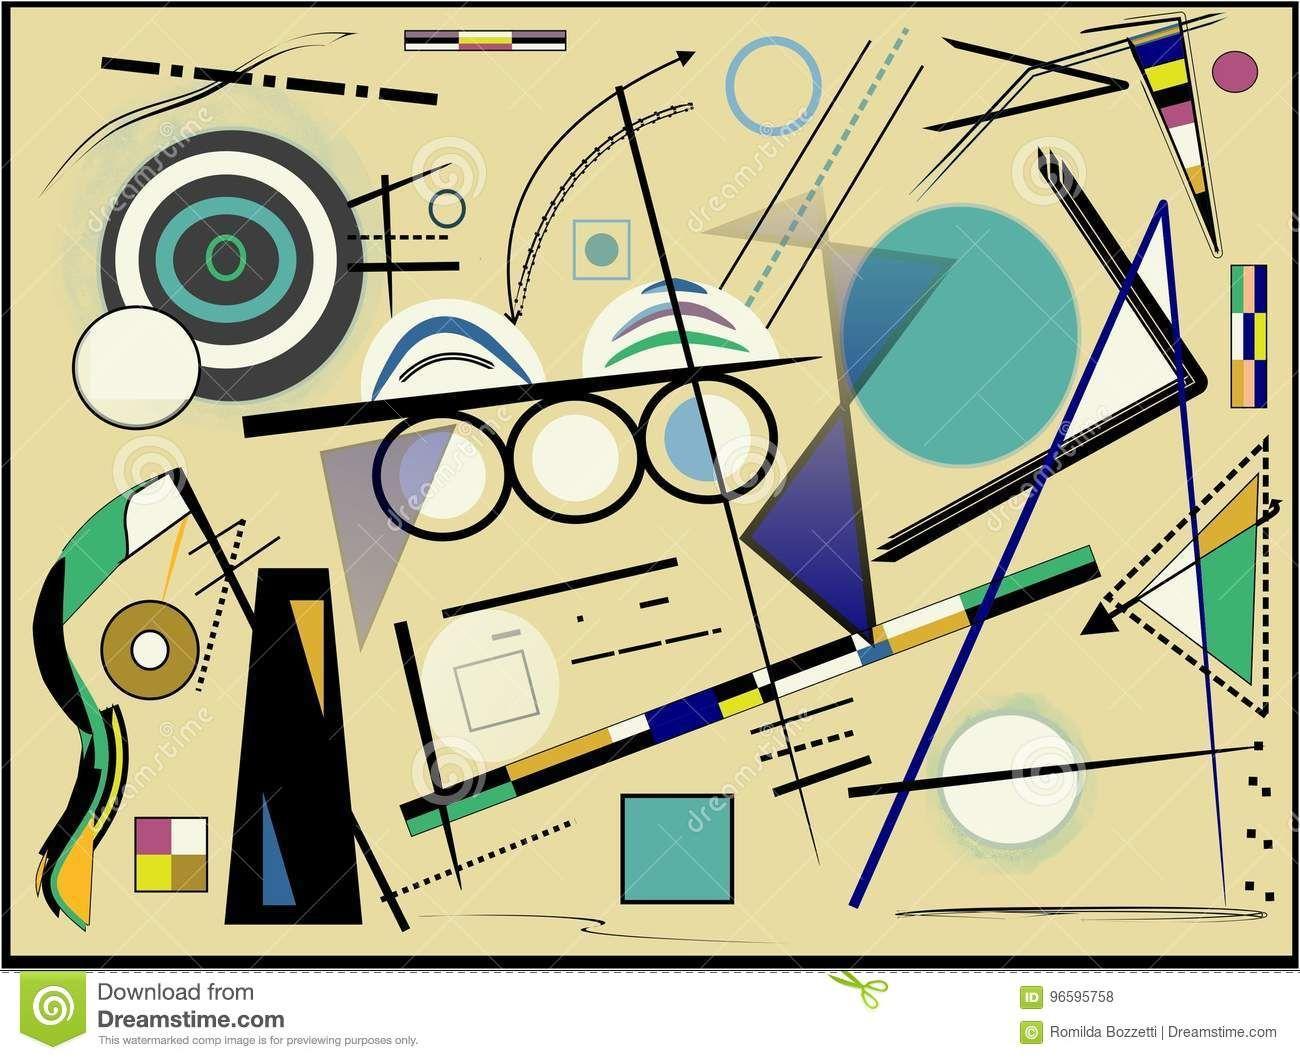 No frame Color : A, Size Inch Ber/ühmte abstrakte /Ölgem/älde-Kandinsky-geometrische Muster-Leinwand-Malerei Wand-Kunst-Bilder for Wohnzimmer-/Ölgem/älde Poster : 30x45cm